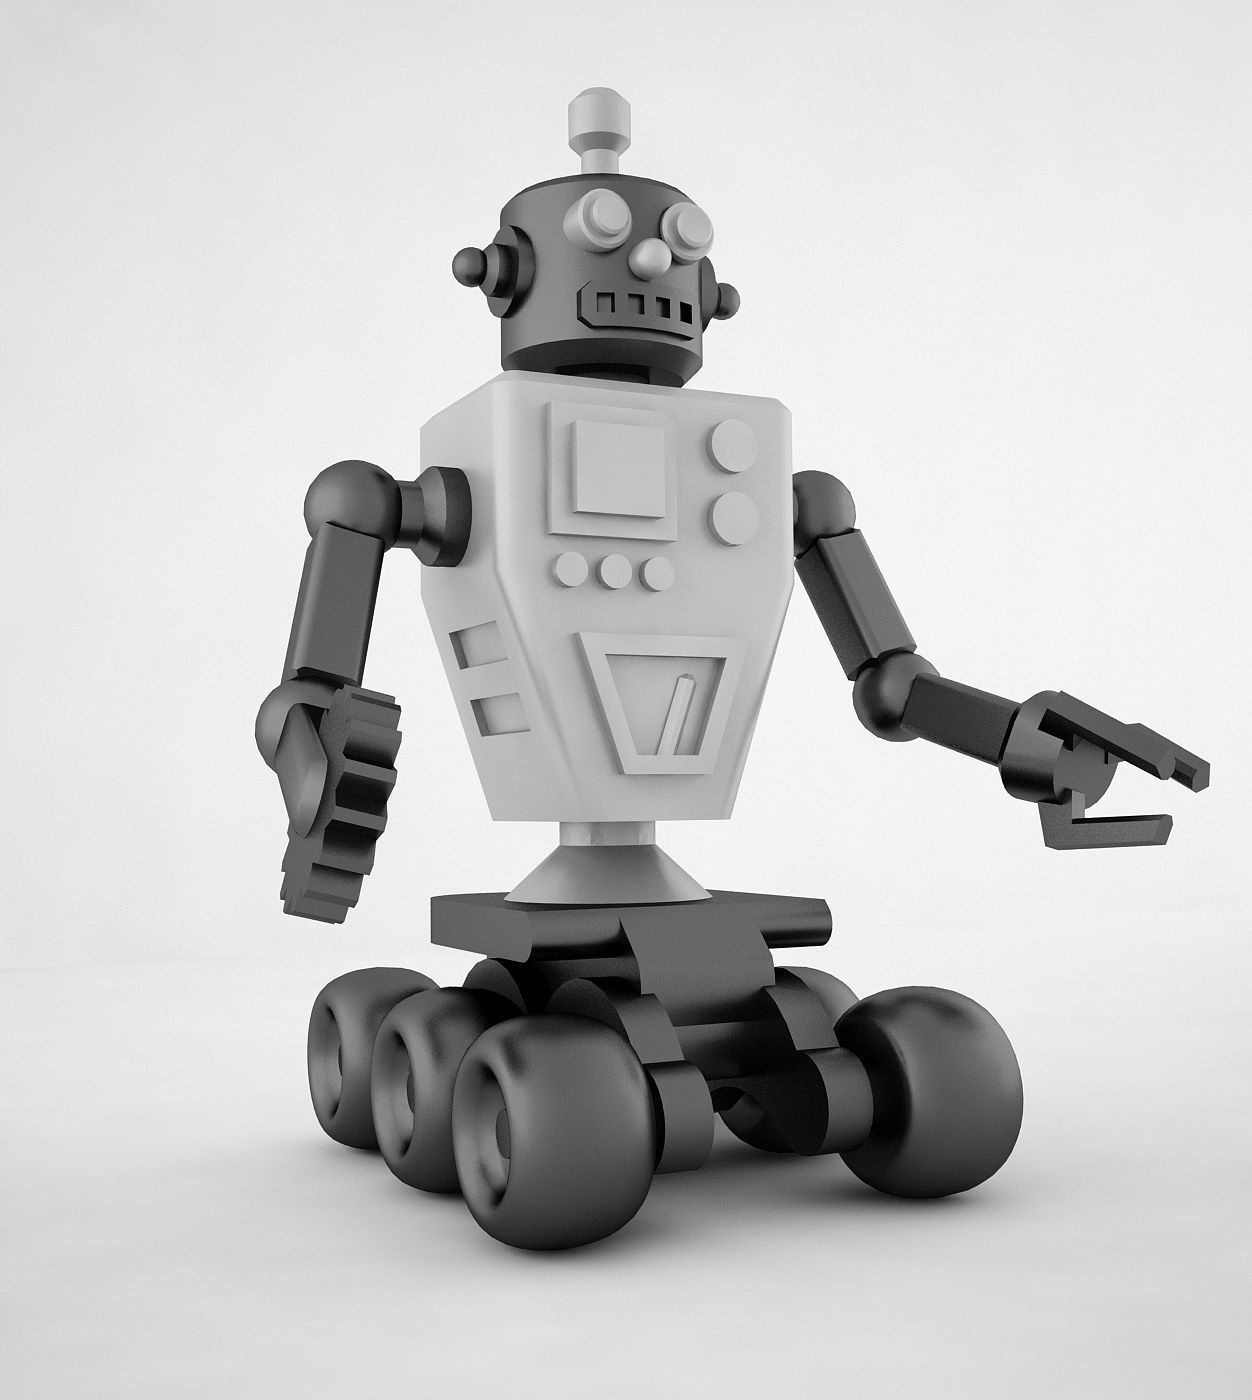 Retro Robot 3d Low Poly Model | 3D model